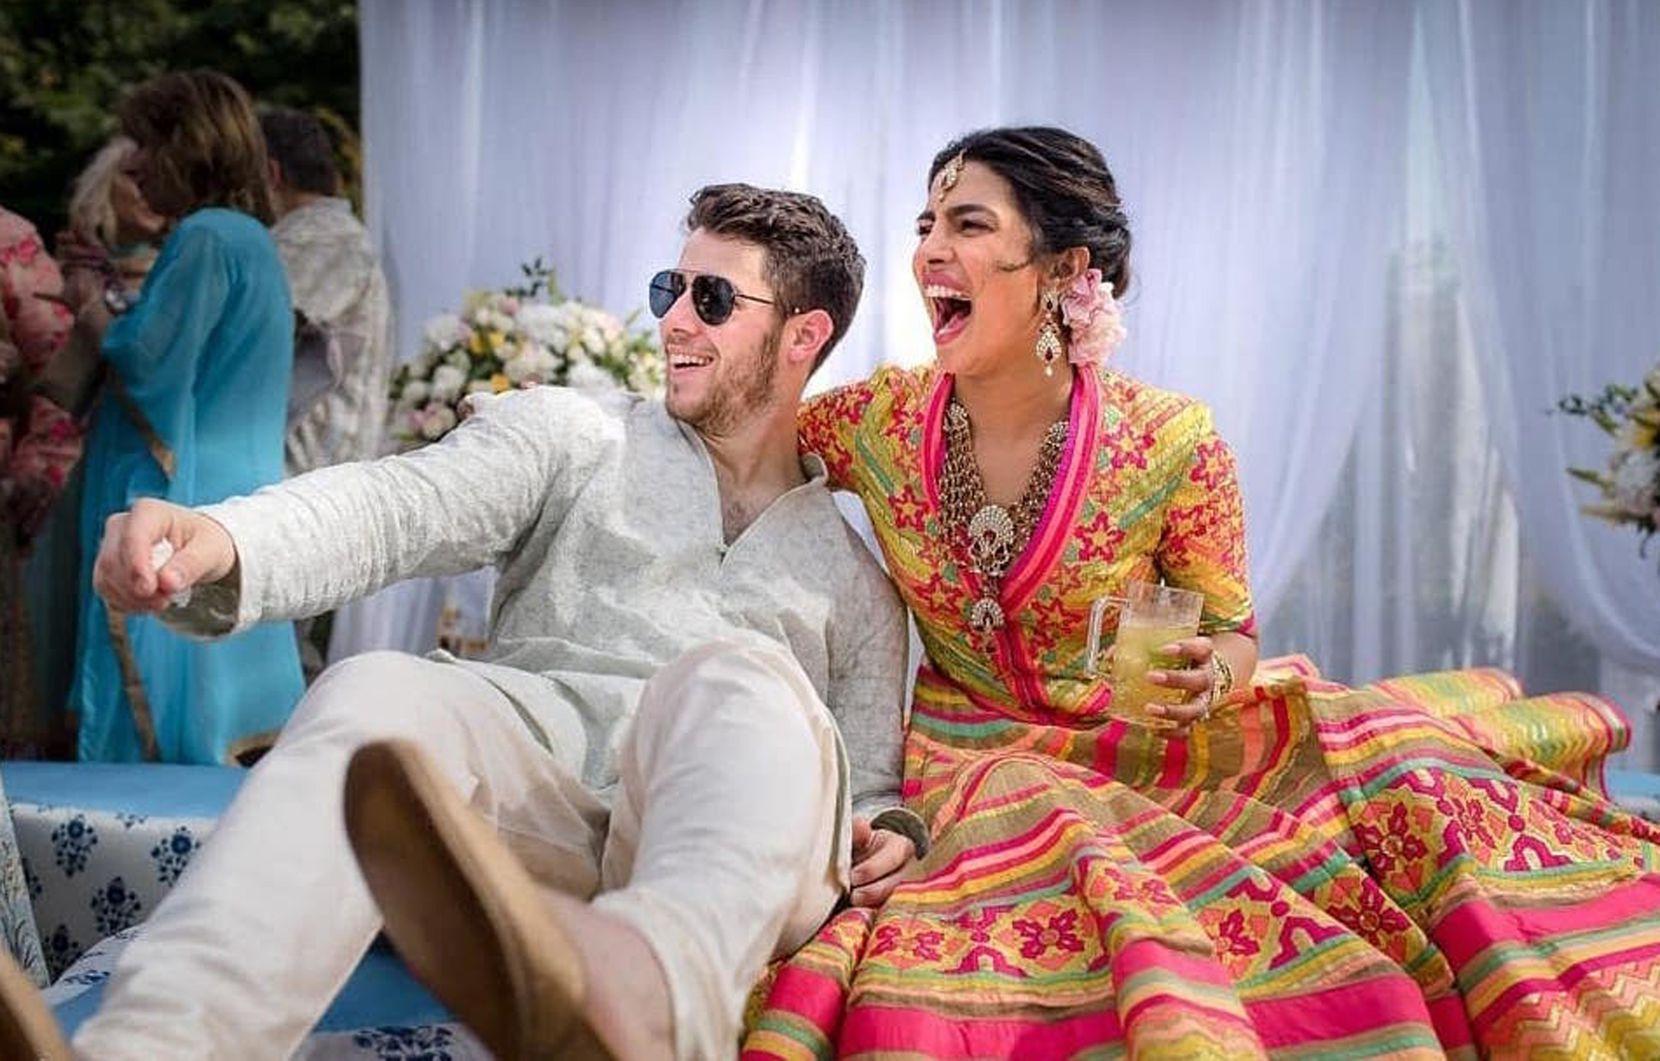 In this handout photo released by Raindrop Media, Bollywood actress Priyanka Chopra and Nick Jonas celebrate during a mehendi ceremony at Umaid Bhawan in Jodhpur, India.